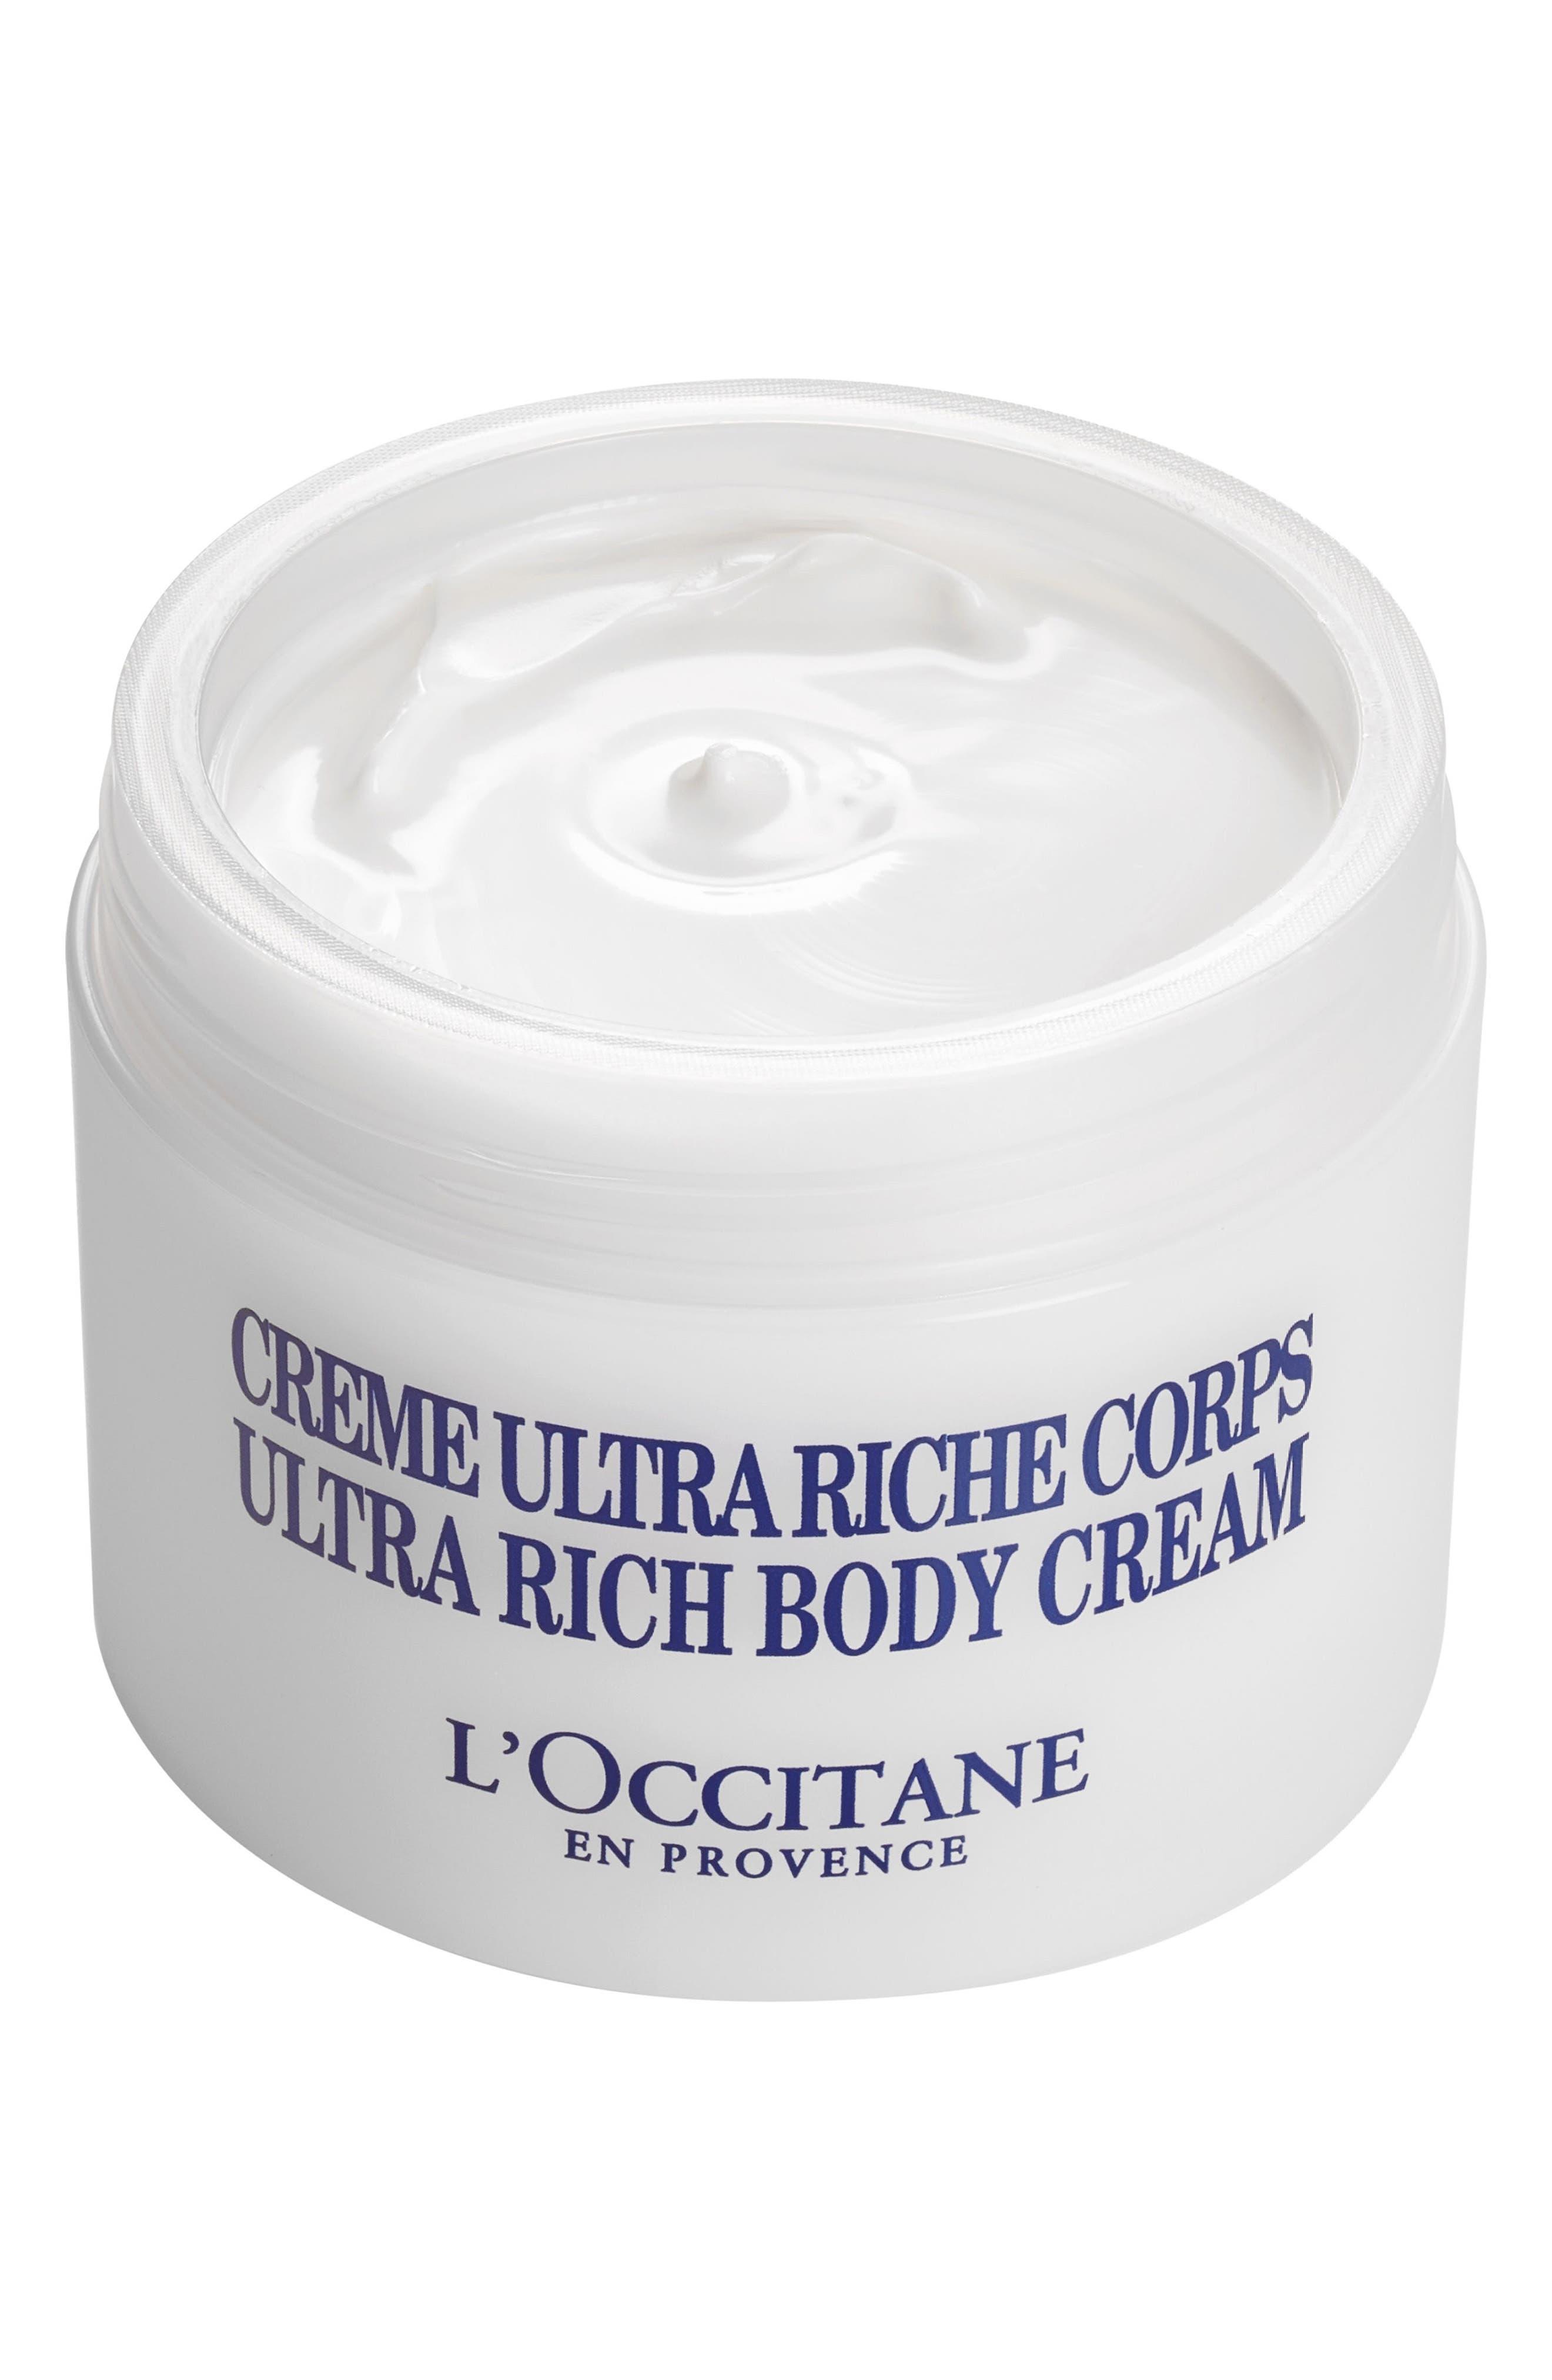 Shea Butter Ultra-Rich Body Cream,                             Alternate thumbnail 2, color,                             No Color